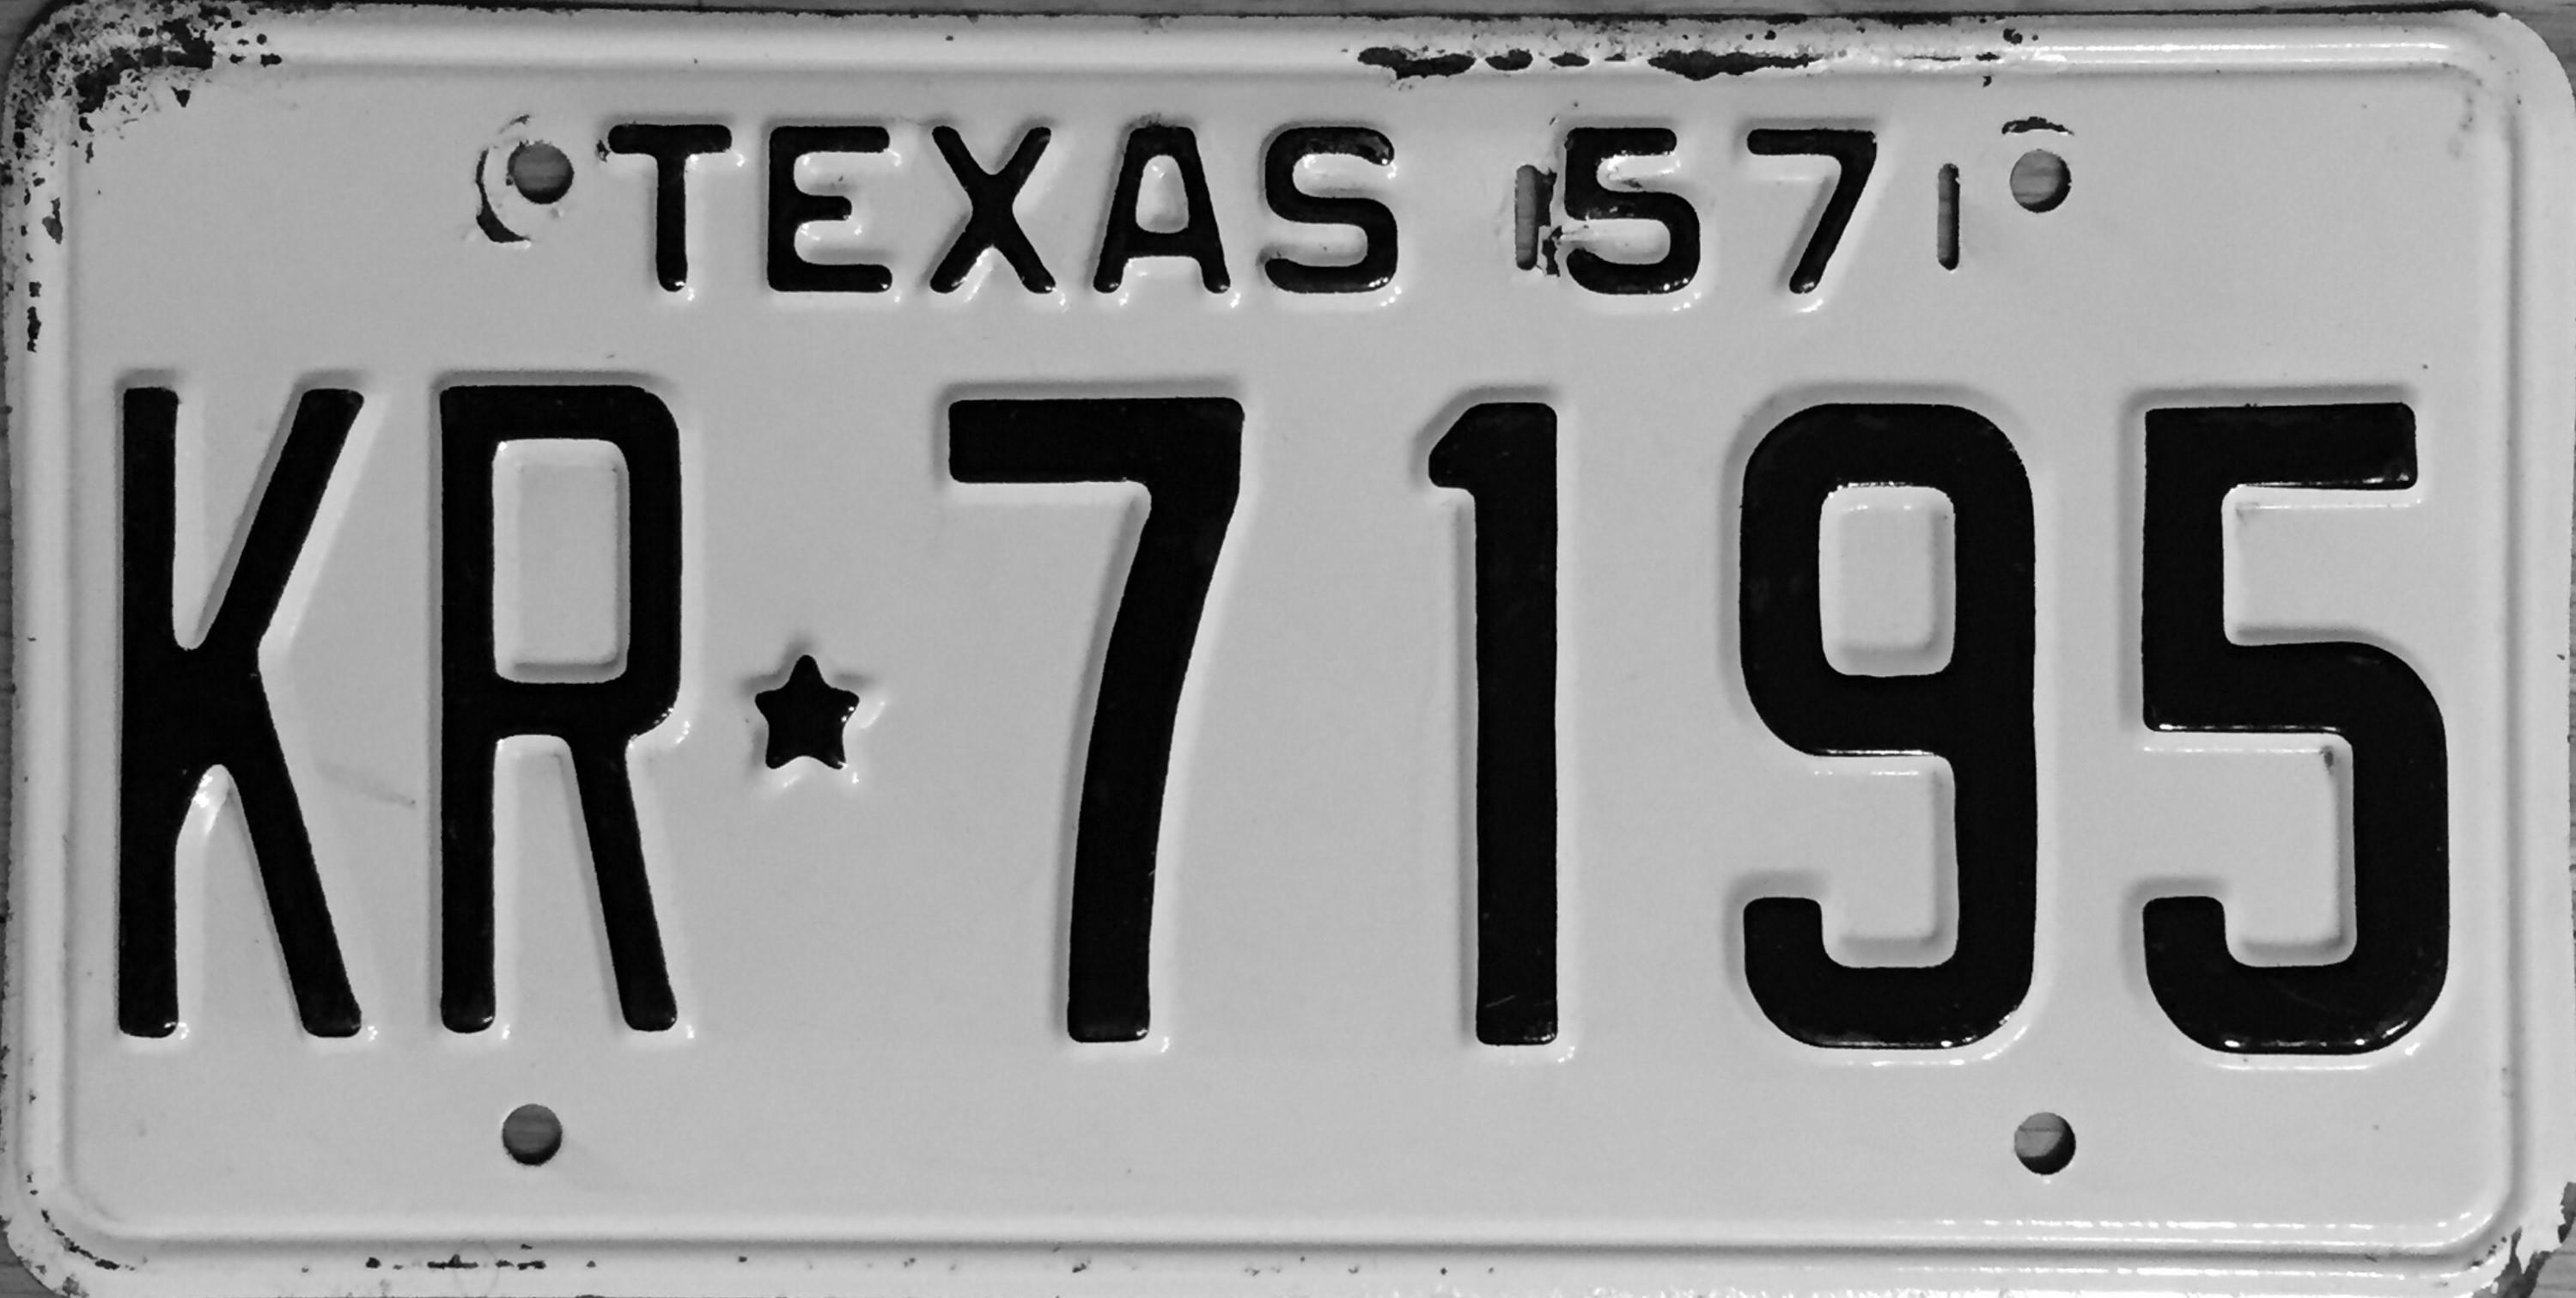 File:1957 Texas license plate.JPG - Wikimedia Commons